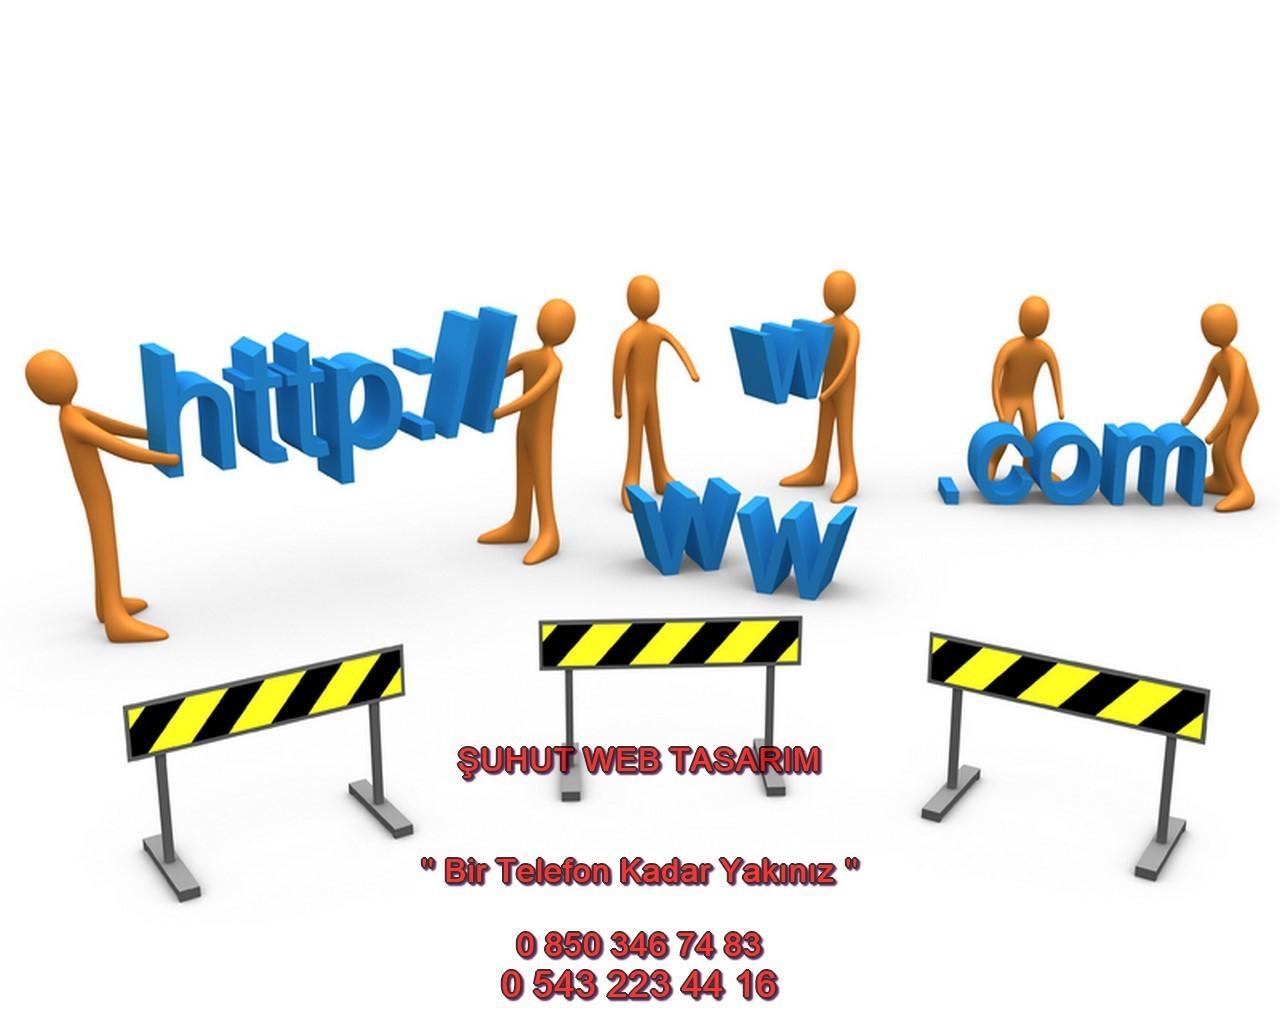 Şuhut Web Tasarım